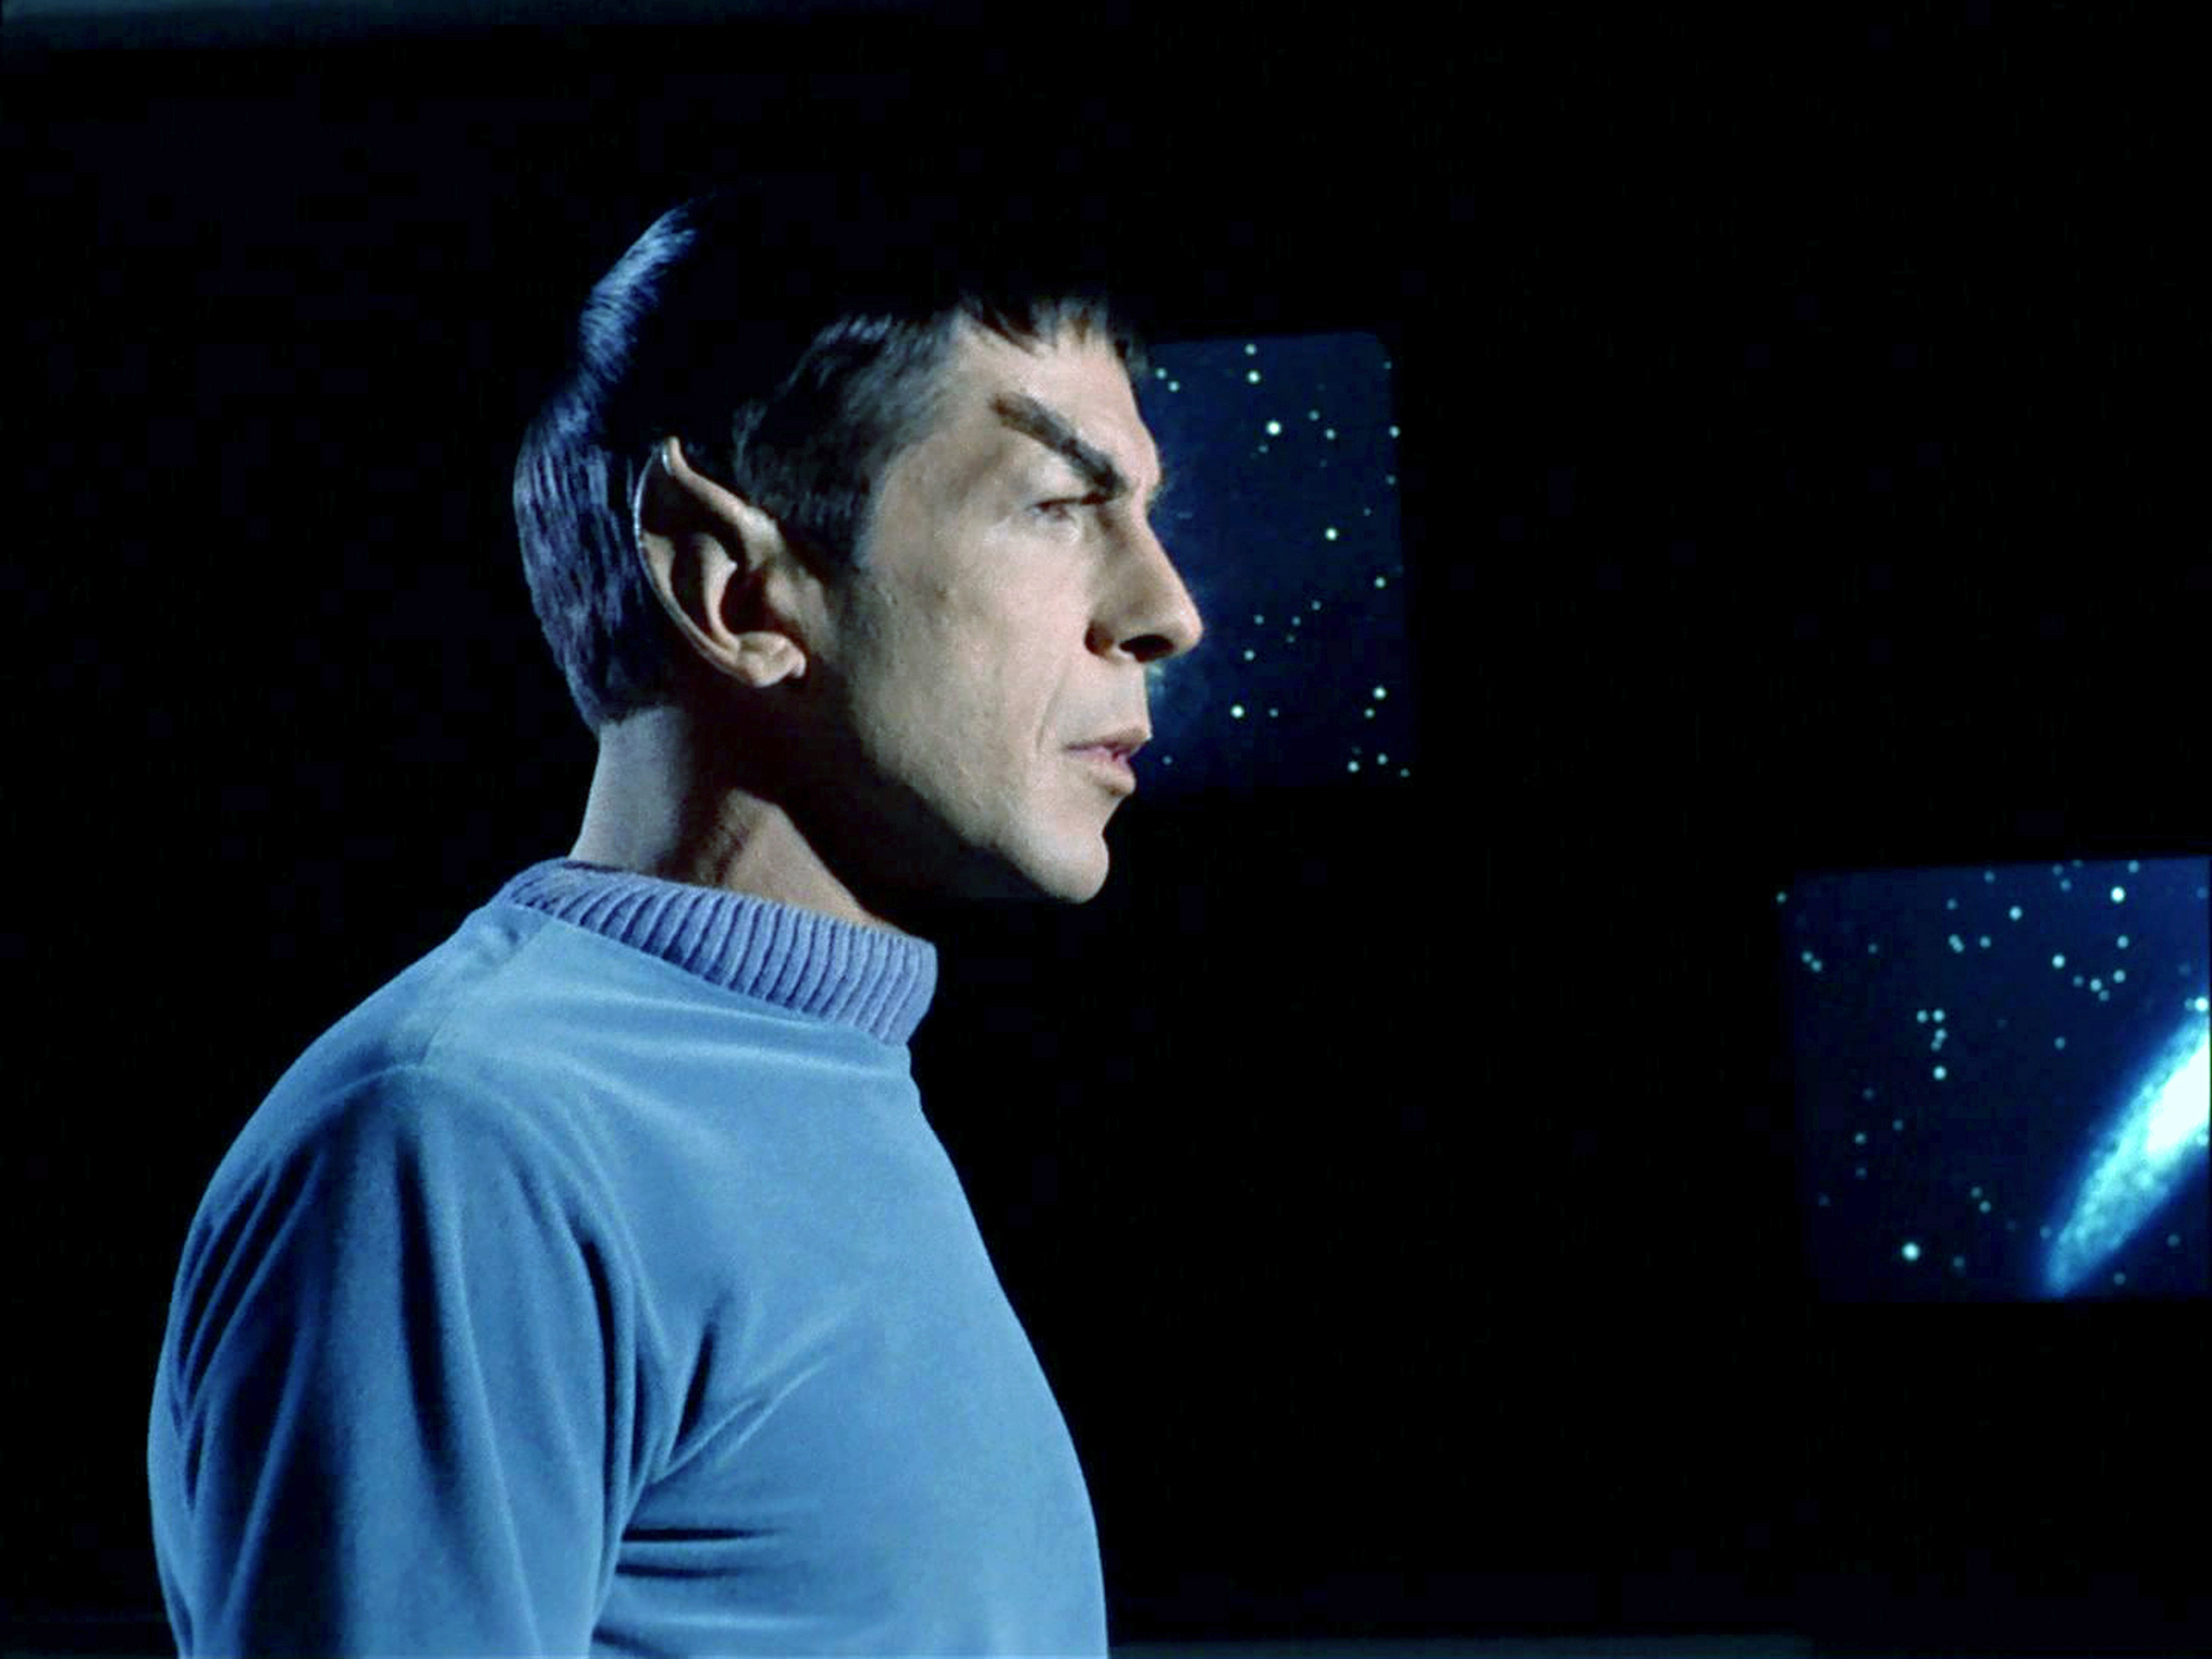 Leonard Nimoy as Commander Spock in the Star Trek: The Original Series, broadcast Oct. 4, 1988.